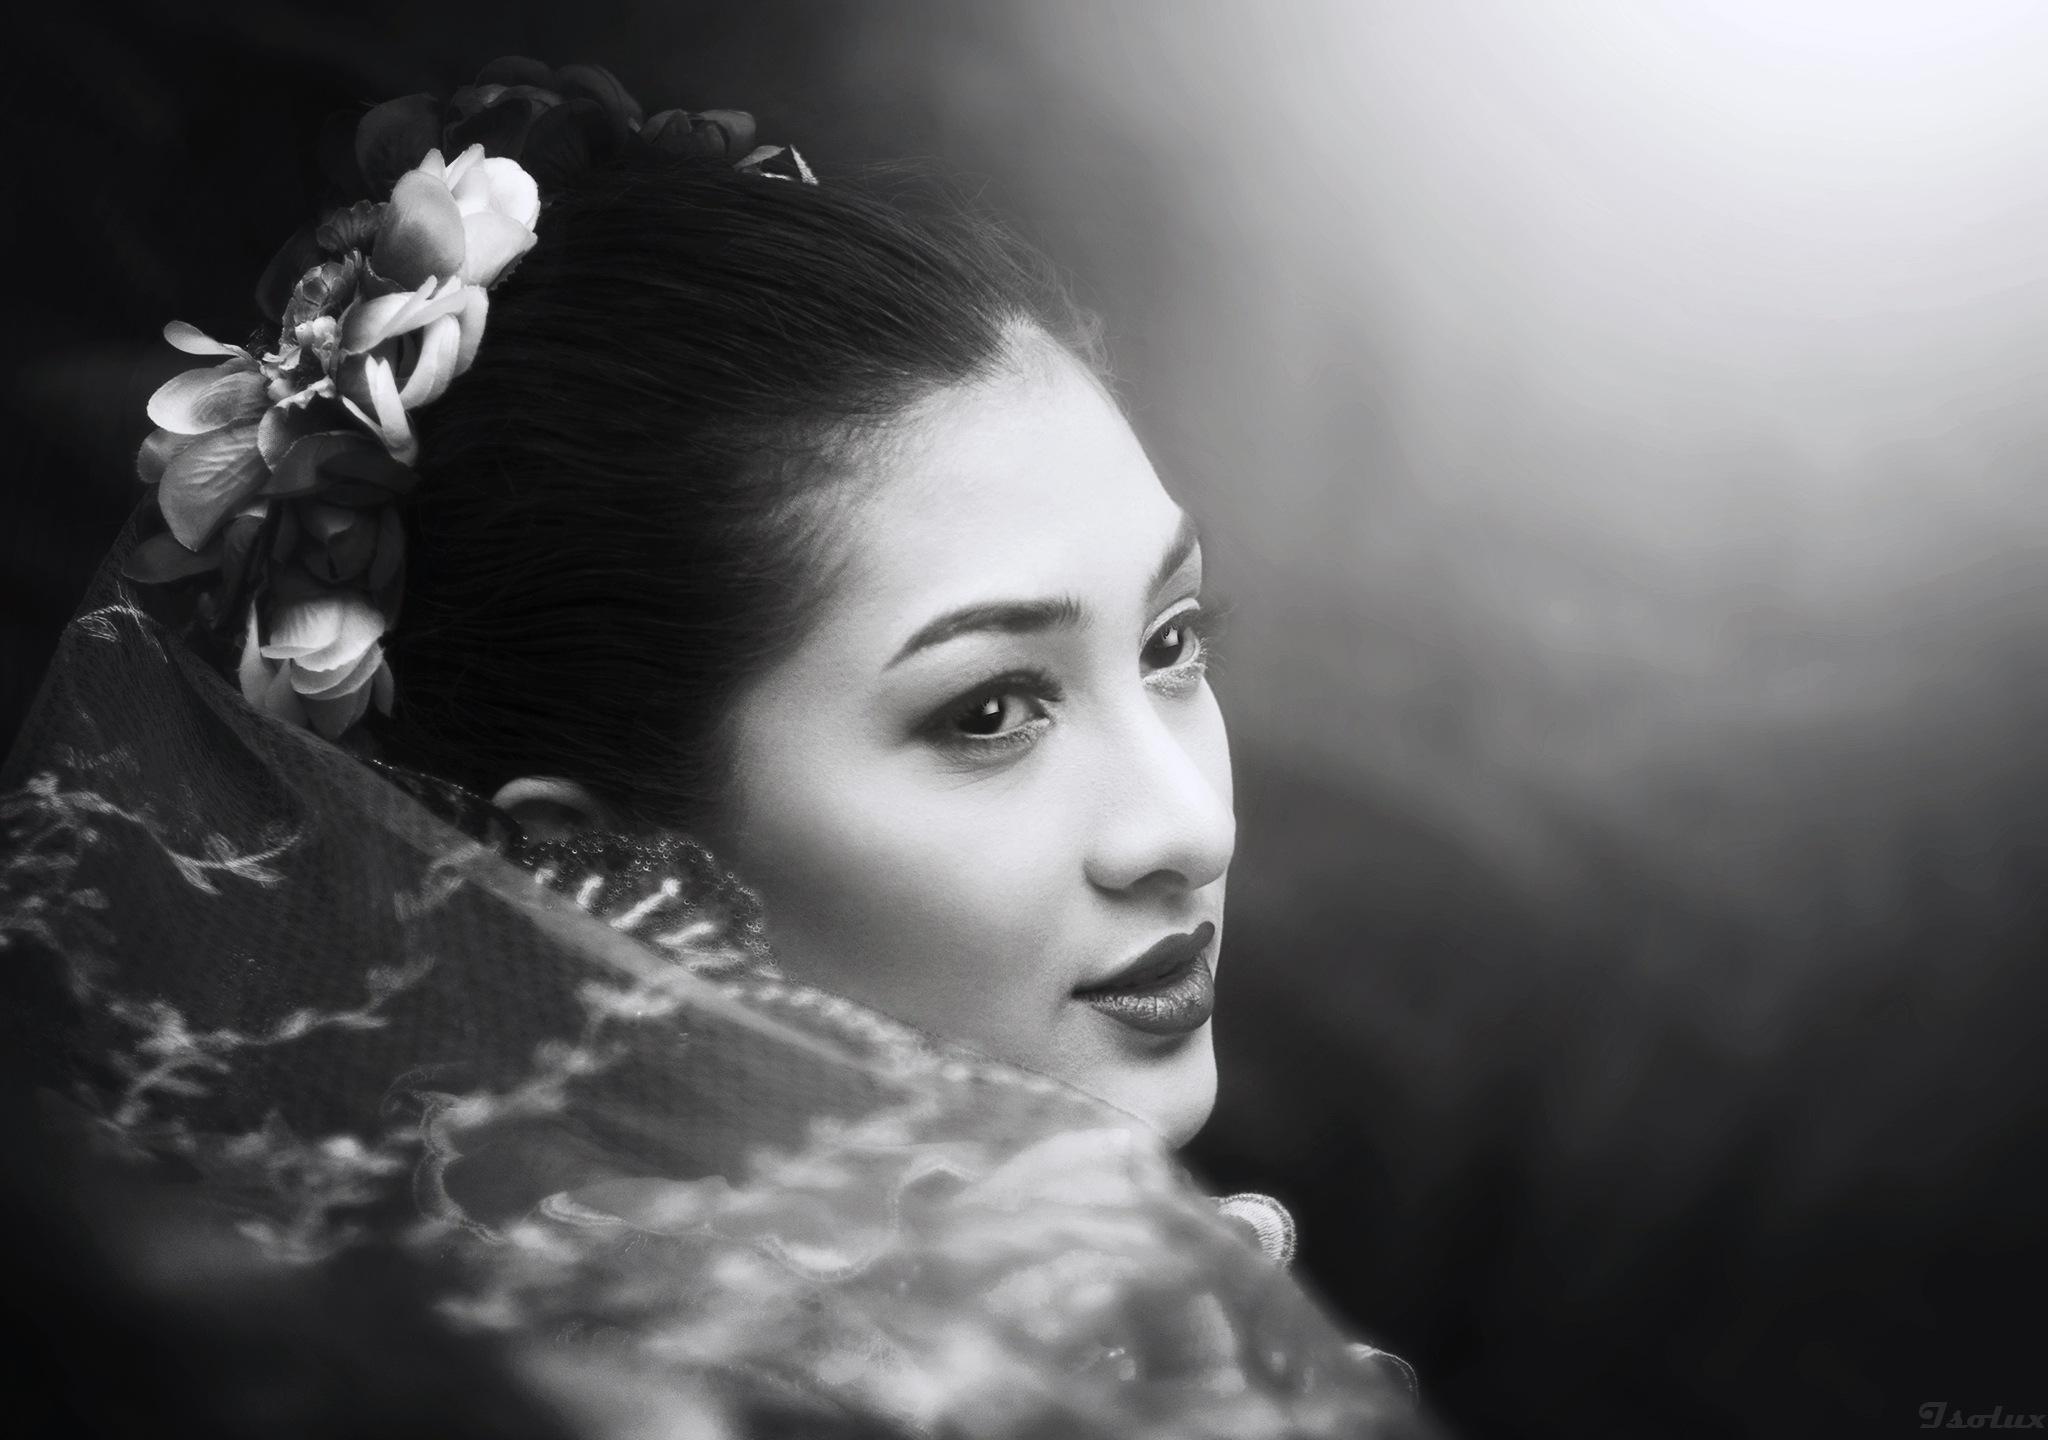 Amira in BW by Ele Hob